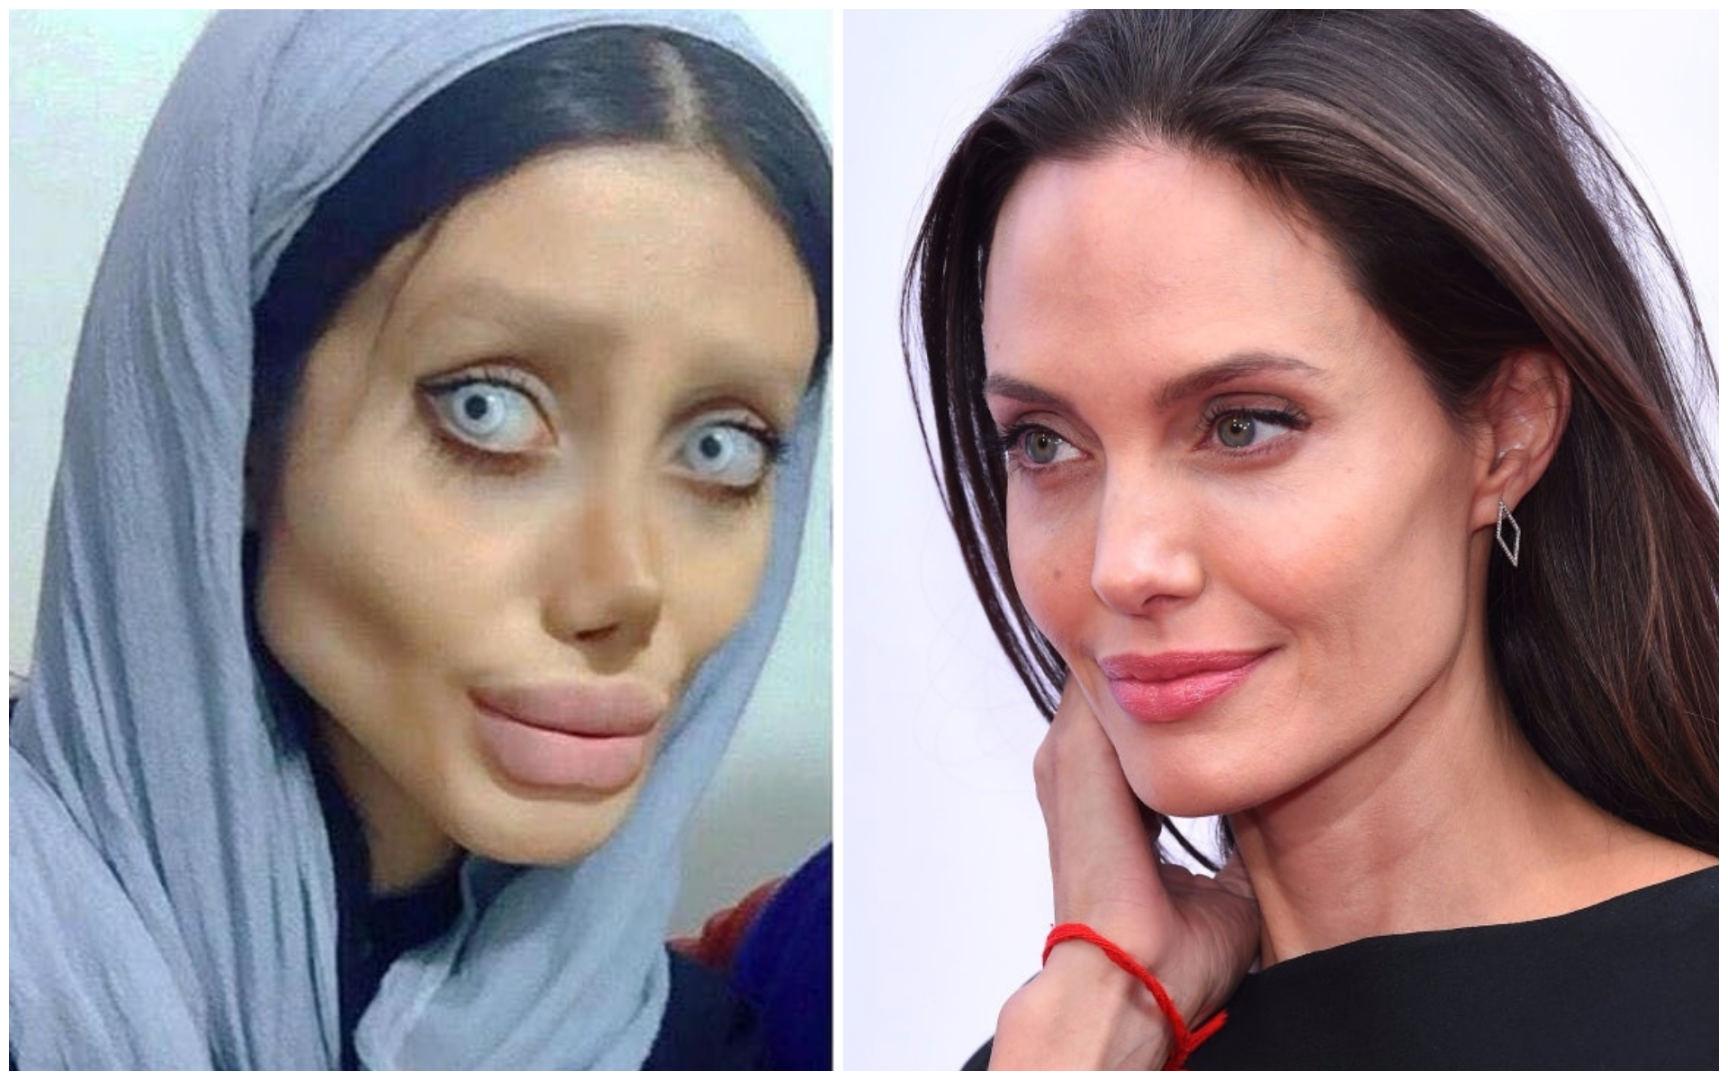 Loca que se parece a Angelina Jolie